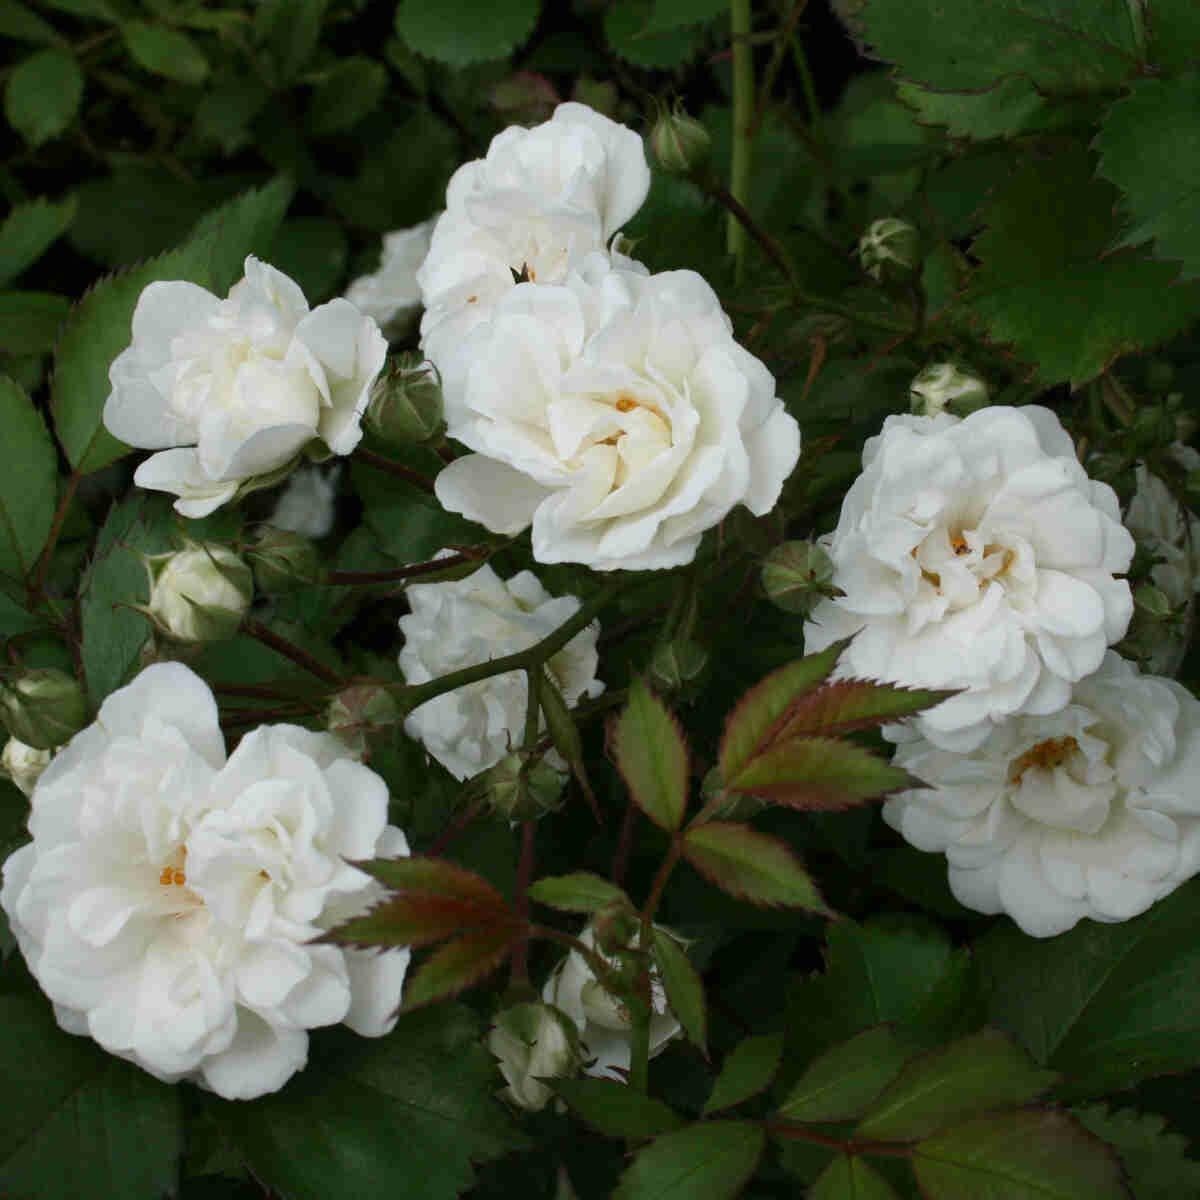 Rosen Alba Meidiland i fuld blomst